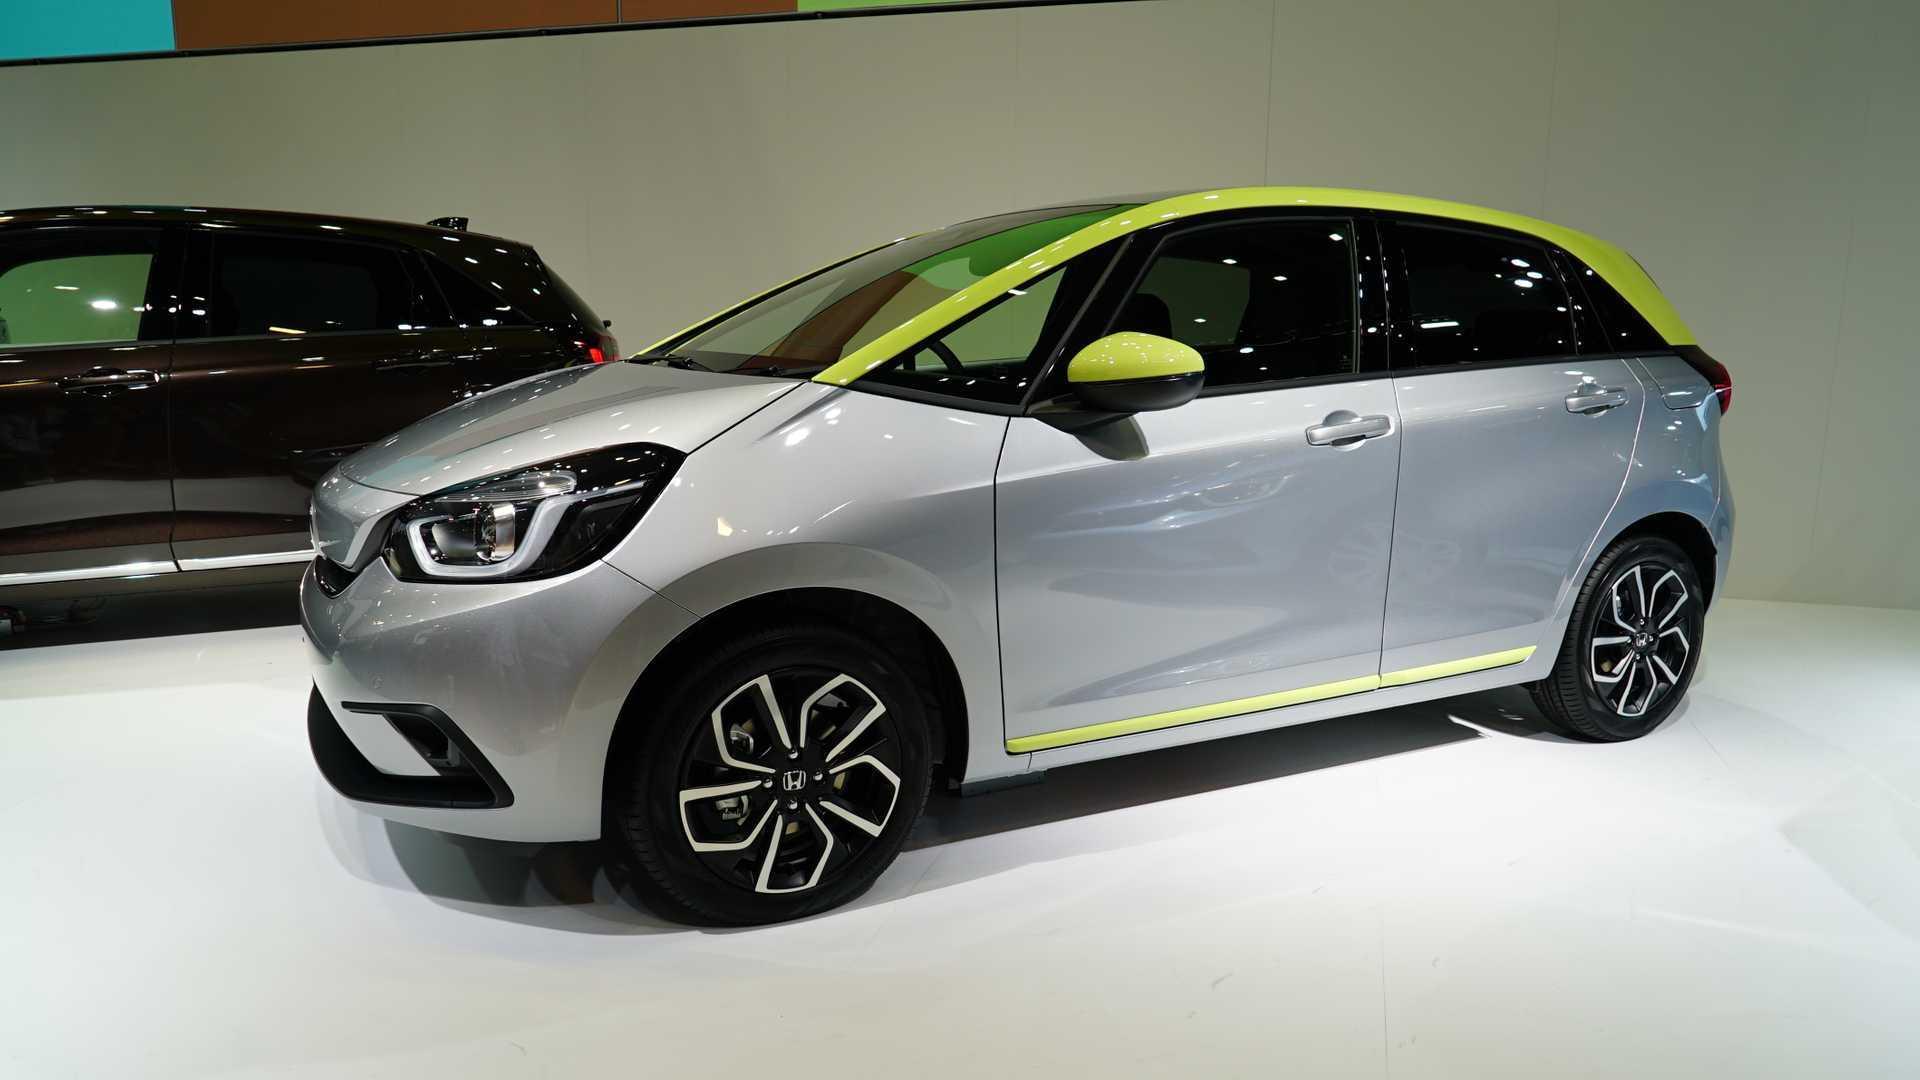 2020 Honda Fit Spesification